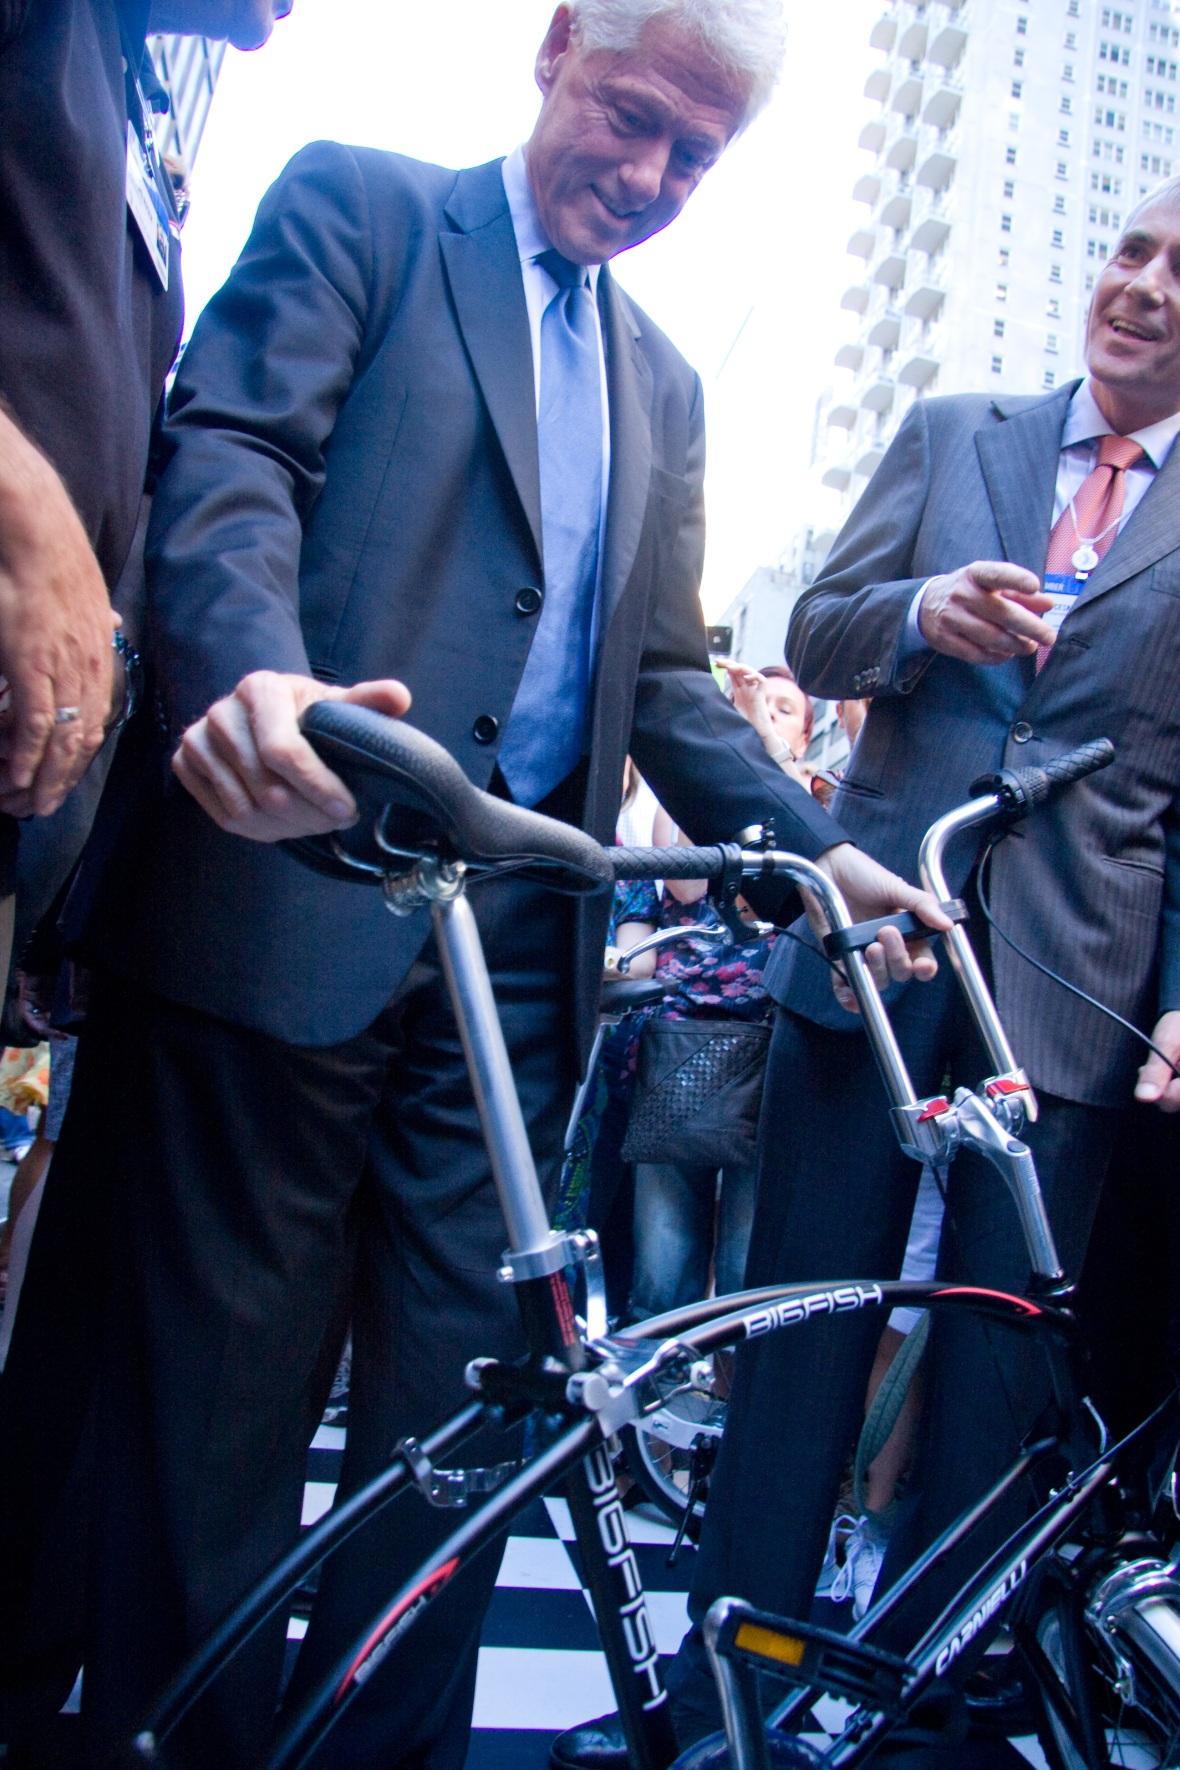 Bill Clinton with Bigfish Folding bike